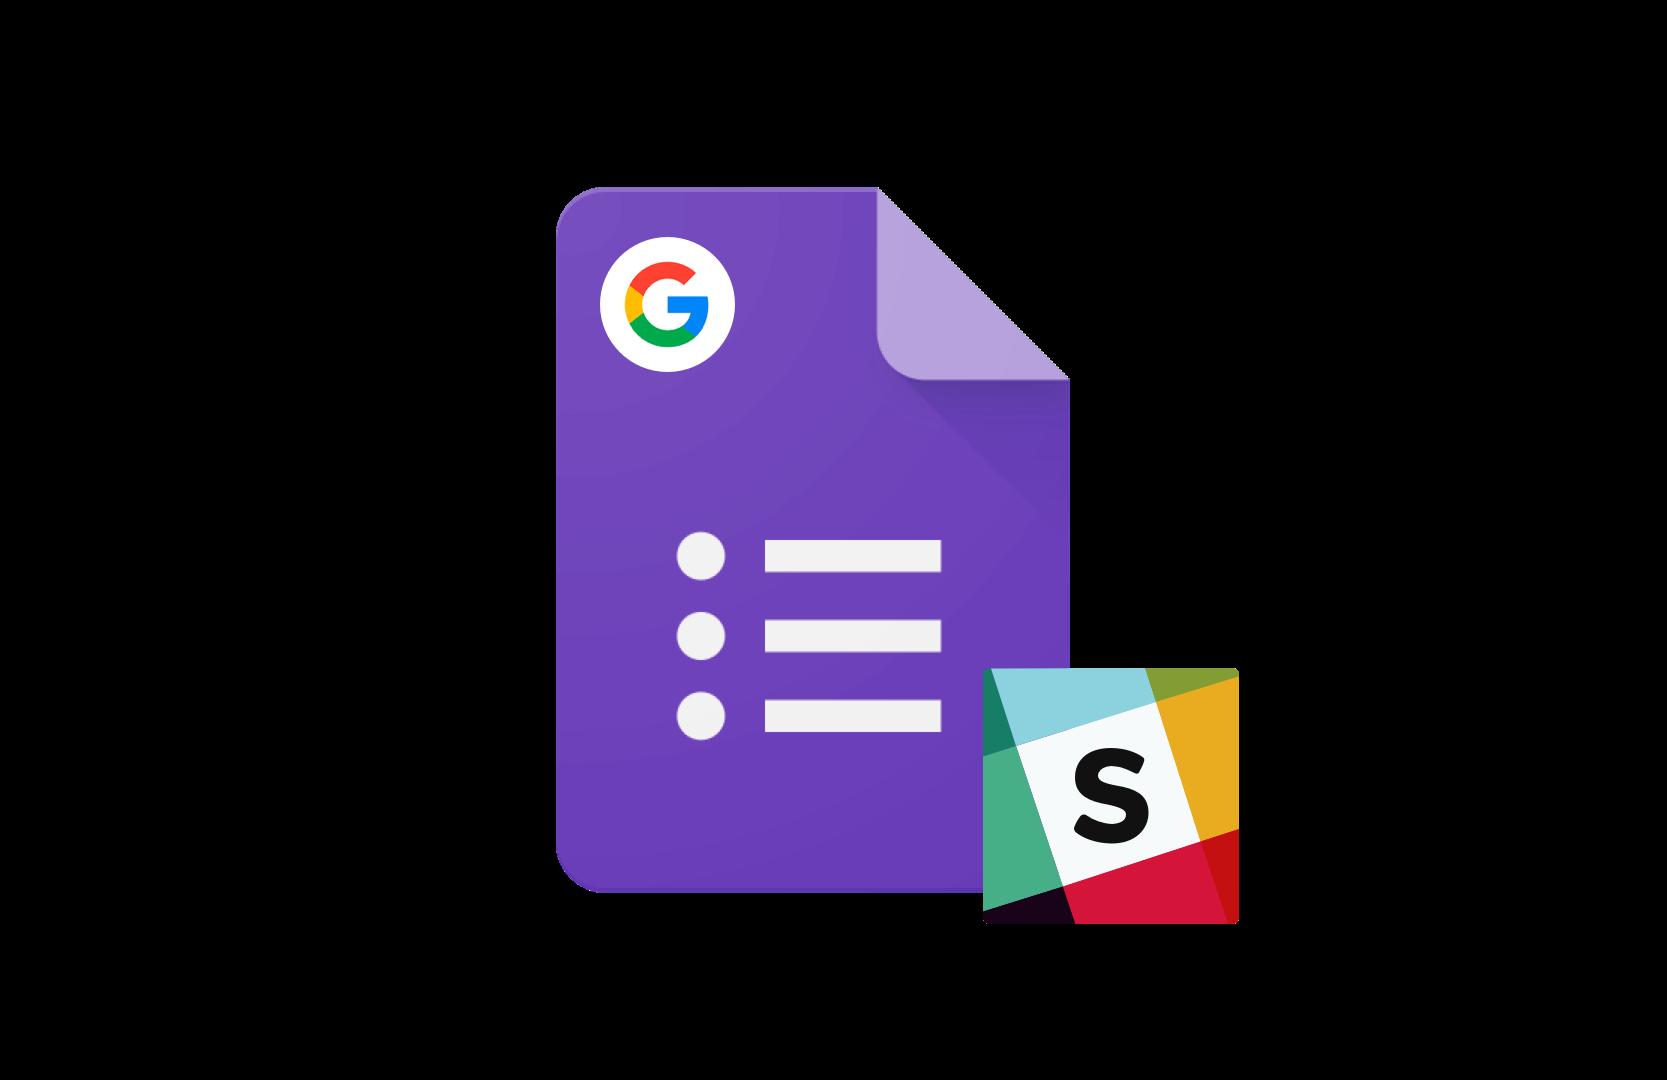 slack and google forms.png